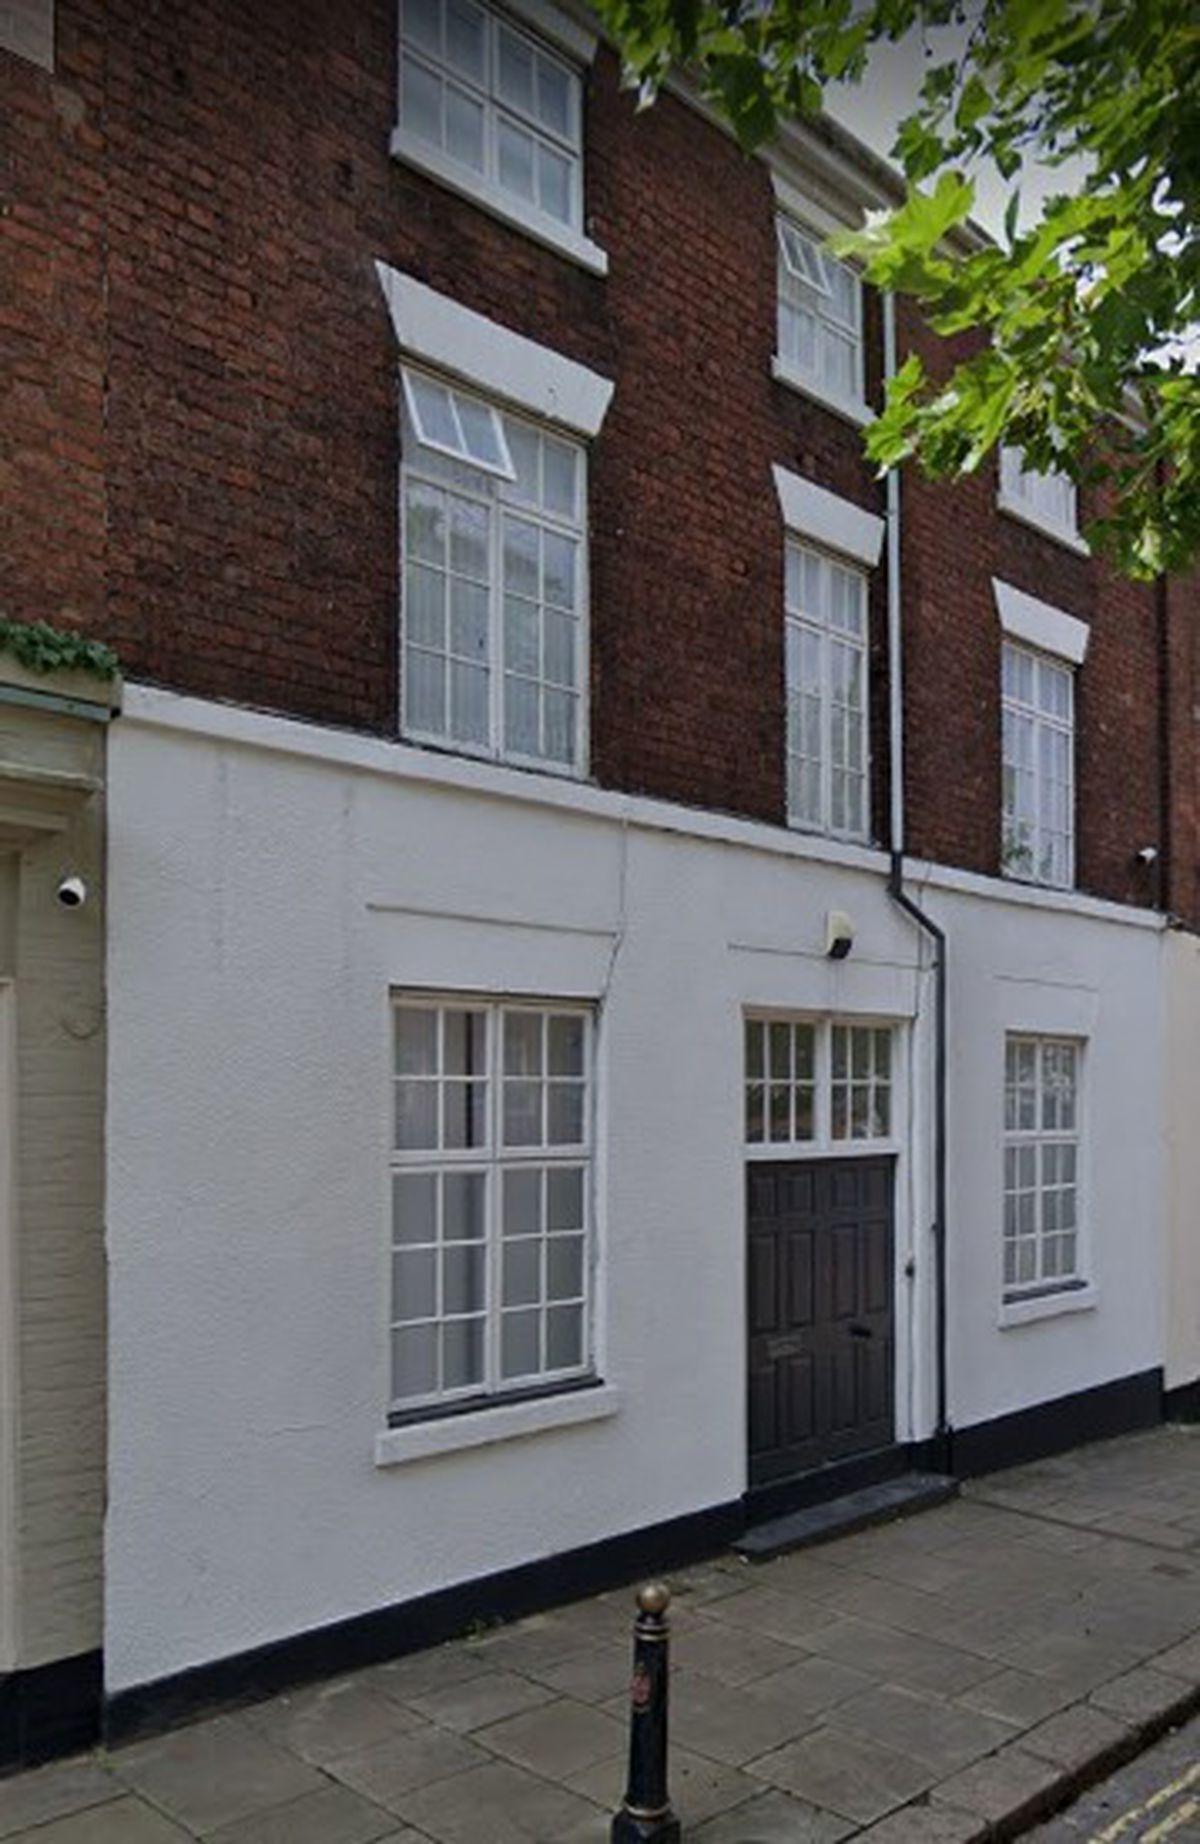 The empty former office building in Bond Street, Wolverhampton. Photo: Google Street View.